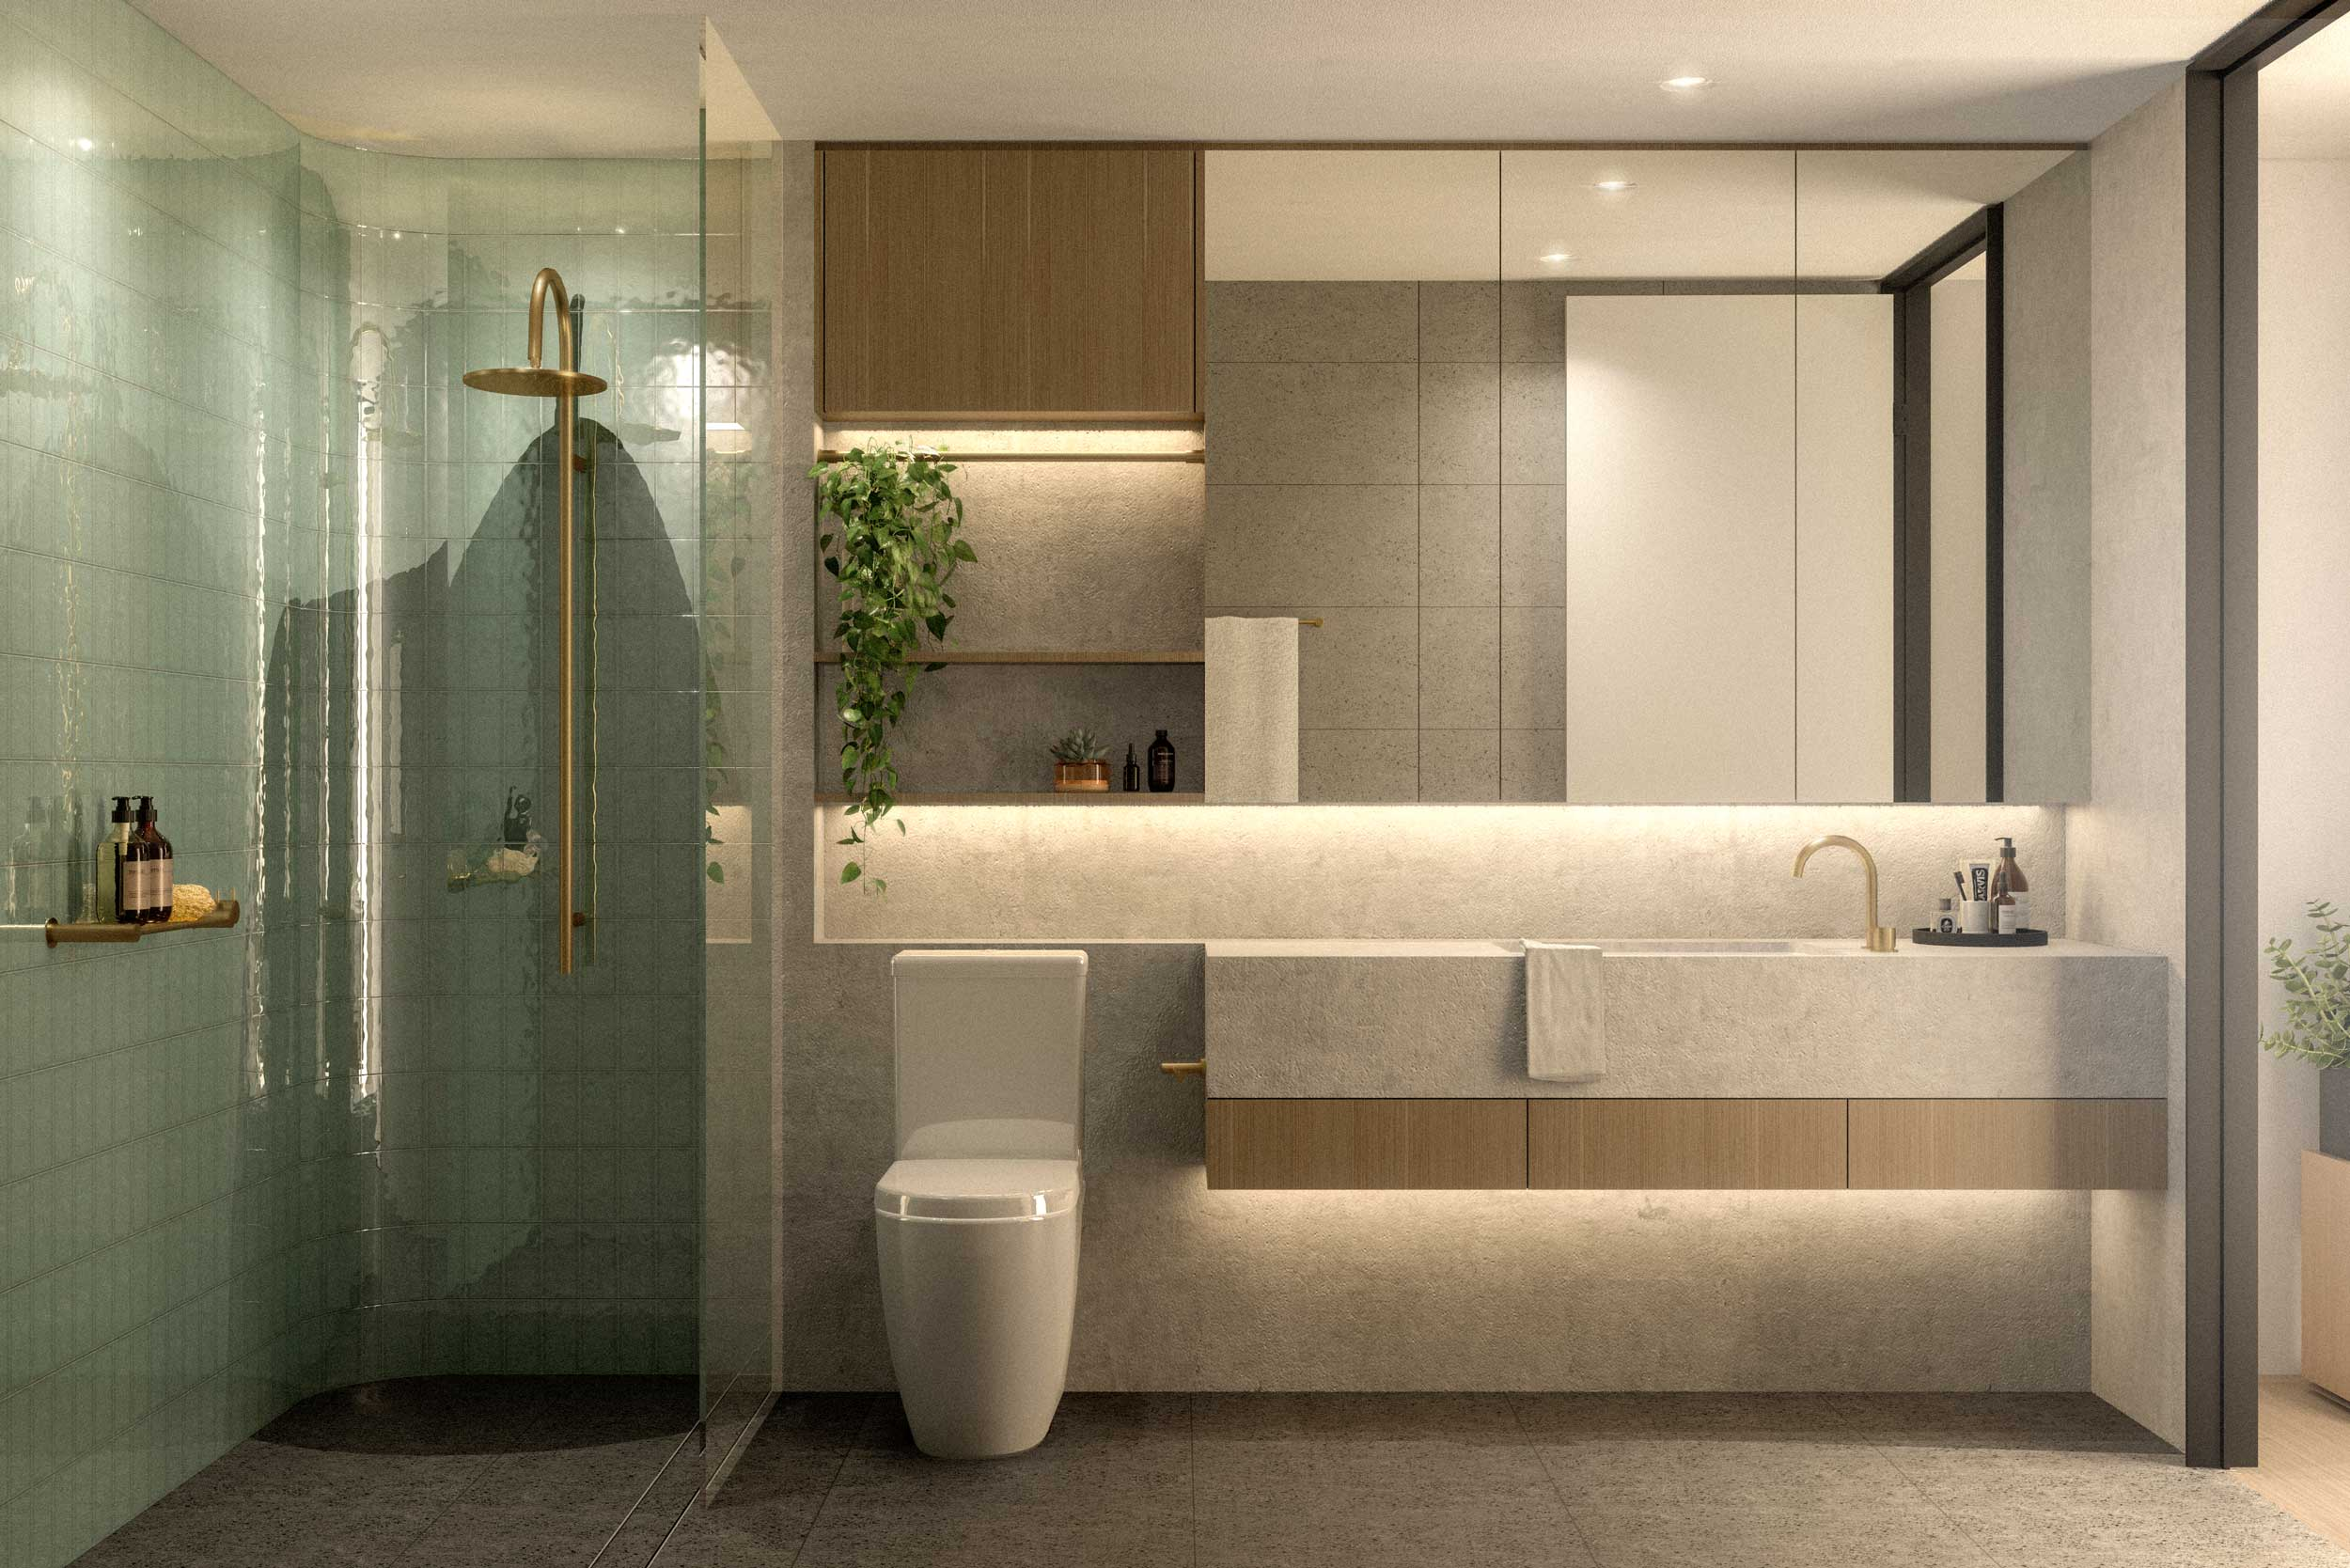 Bathroom-Light-redo.jpg